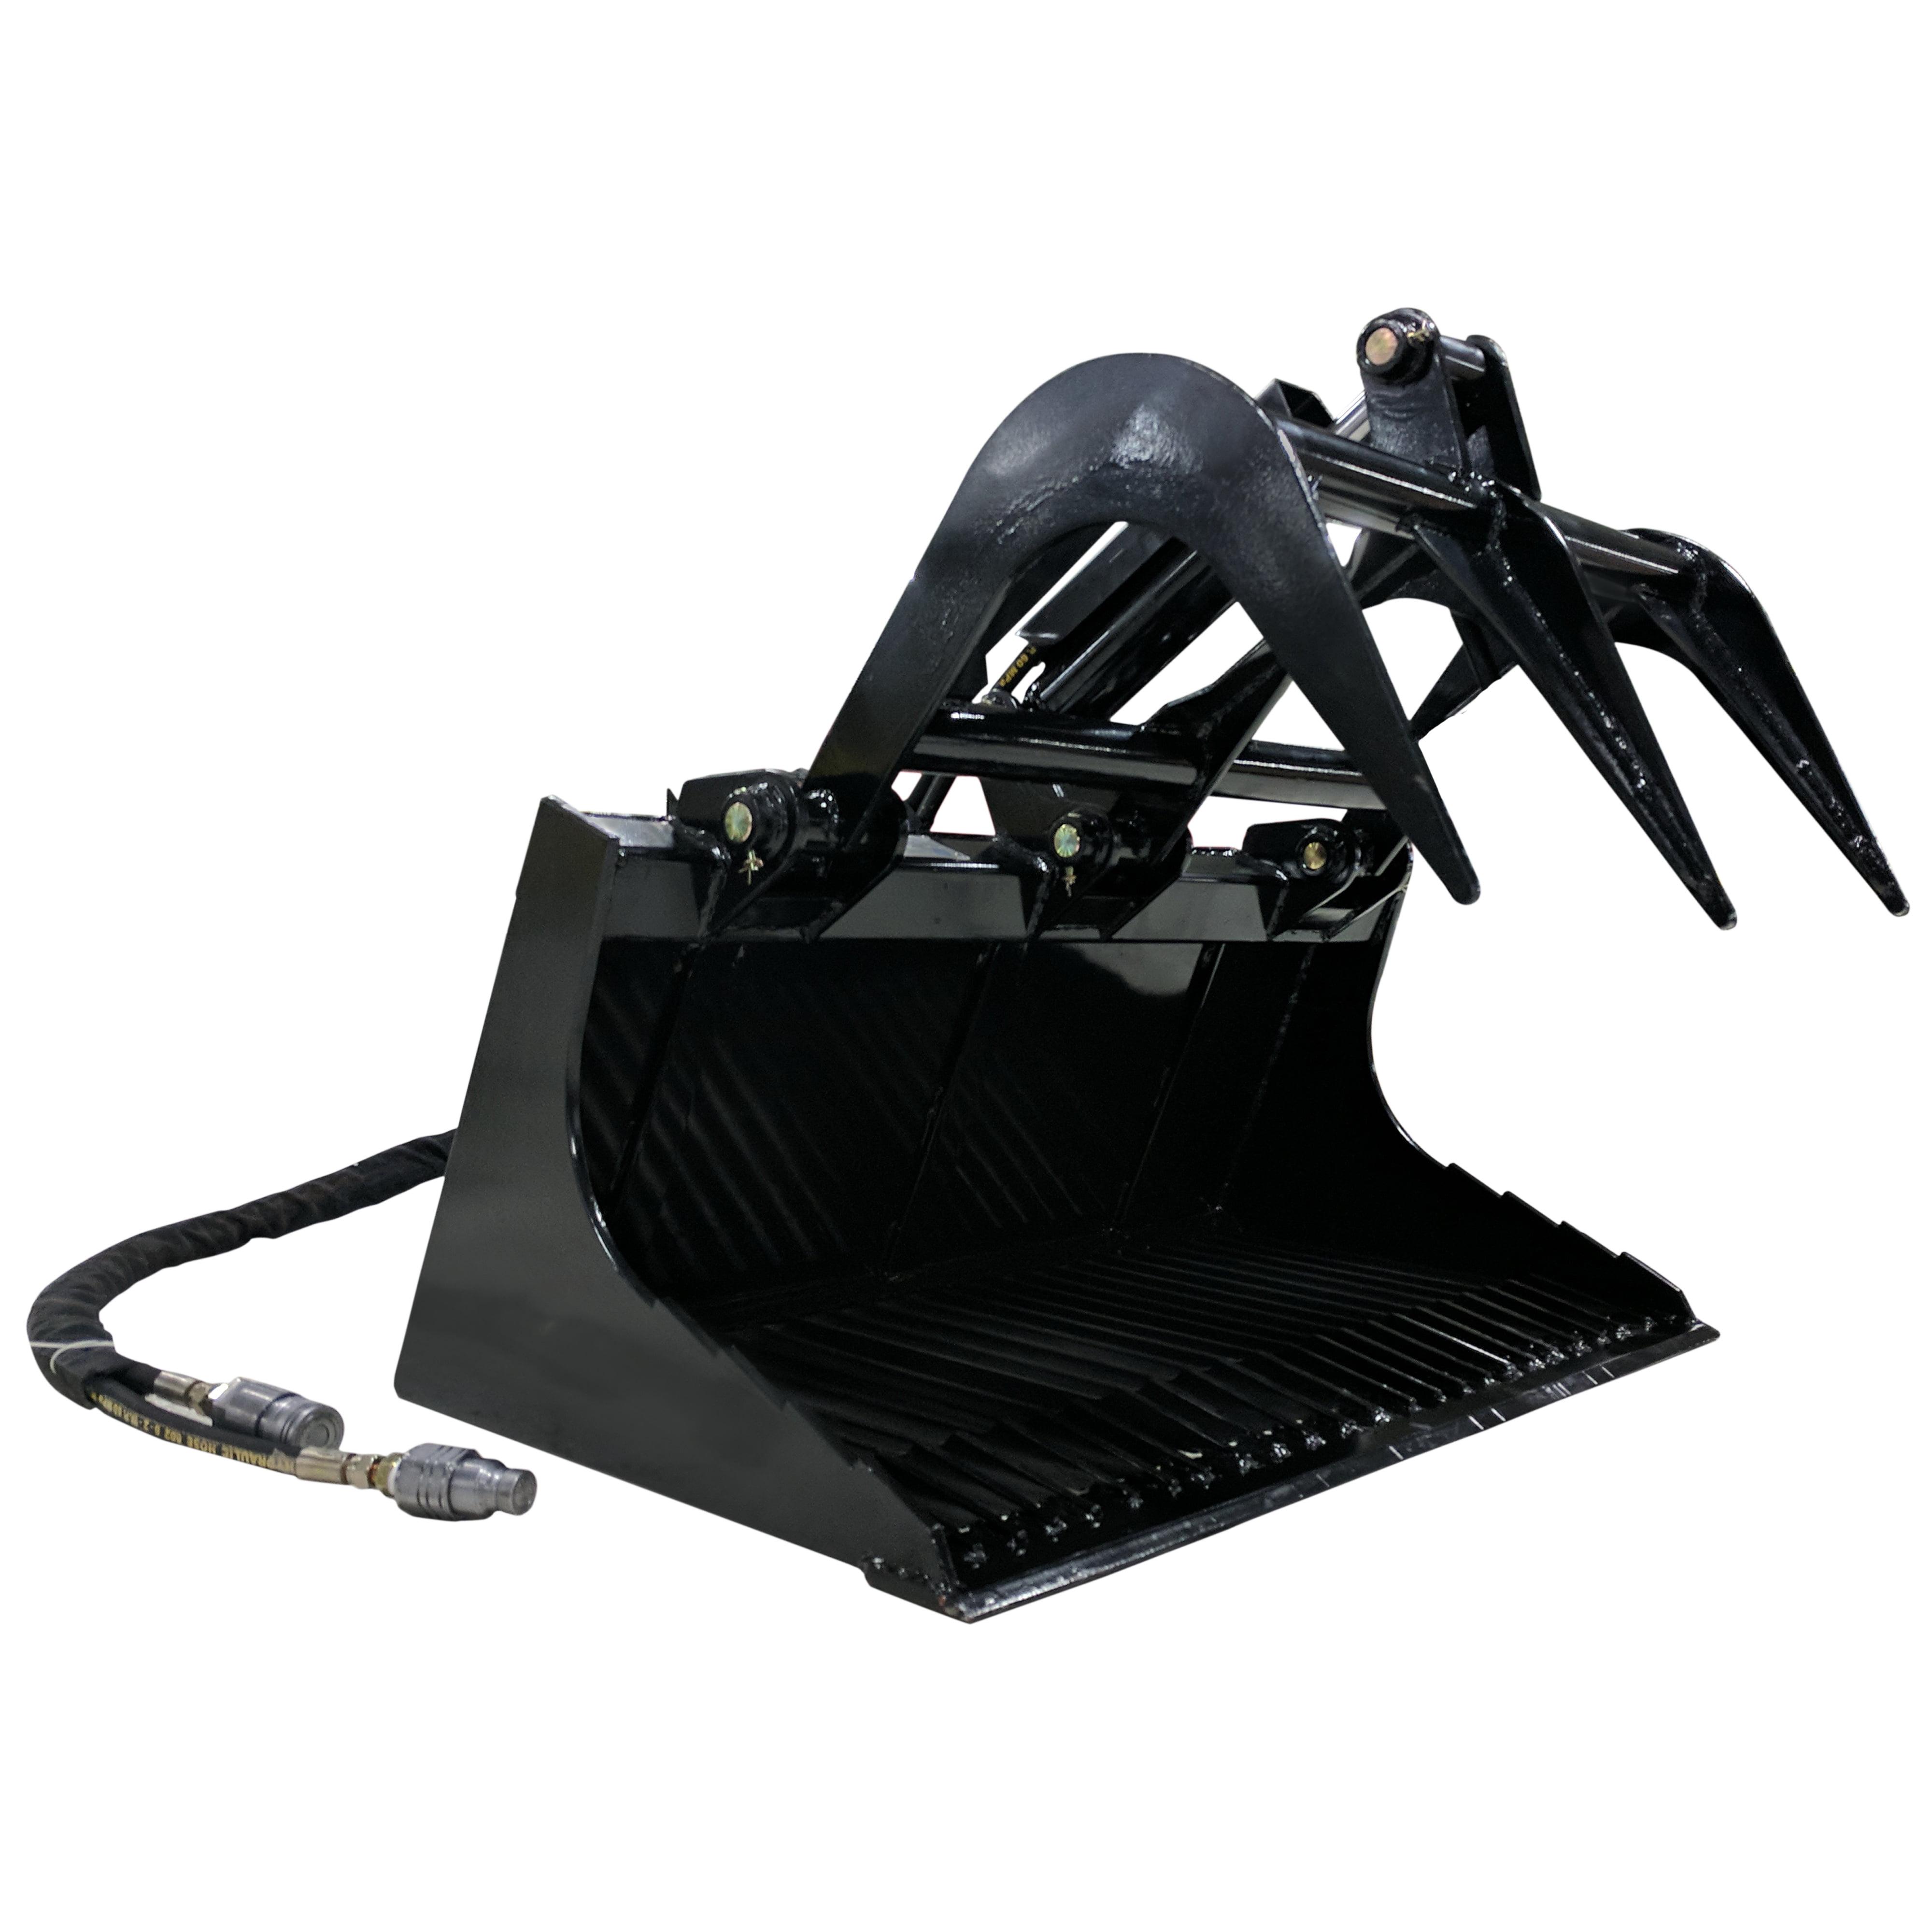 "Titan 36"" Mini Skid Steer Rock Bucket Grapple Attachment"